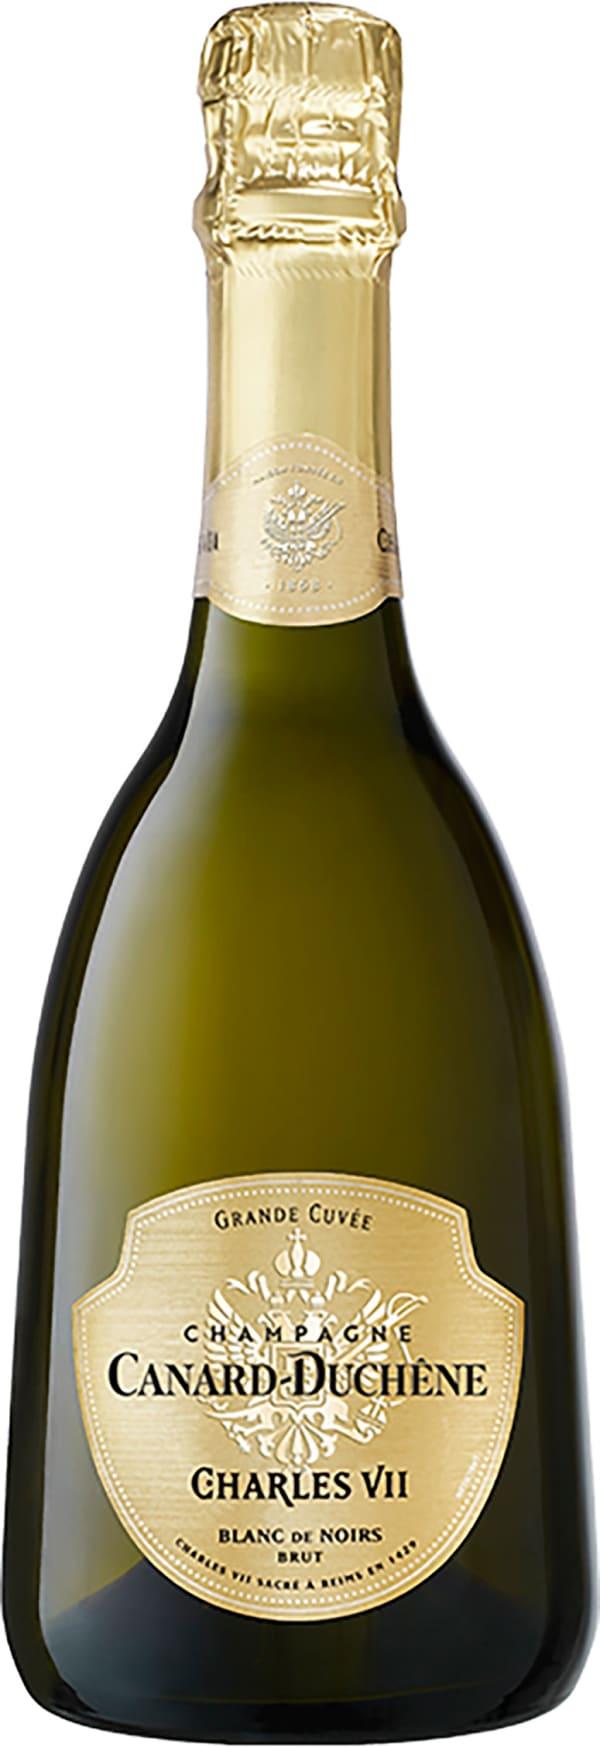 Canard-Duchêne Charles VII Blanc de Noirs Champagne Brut